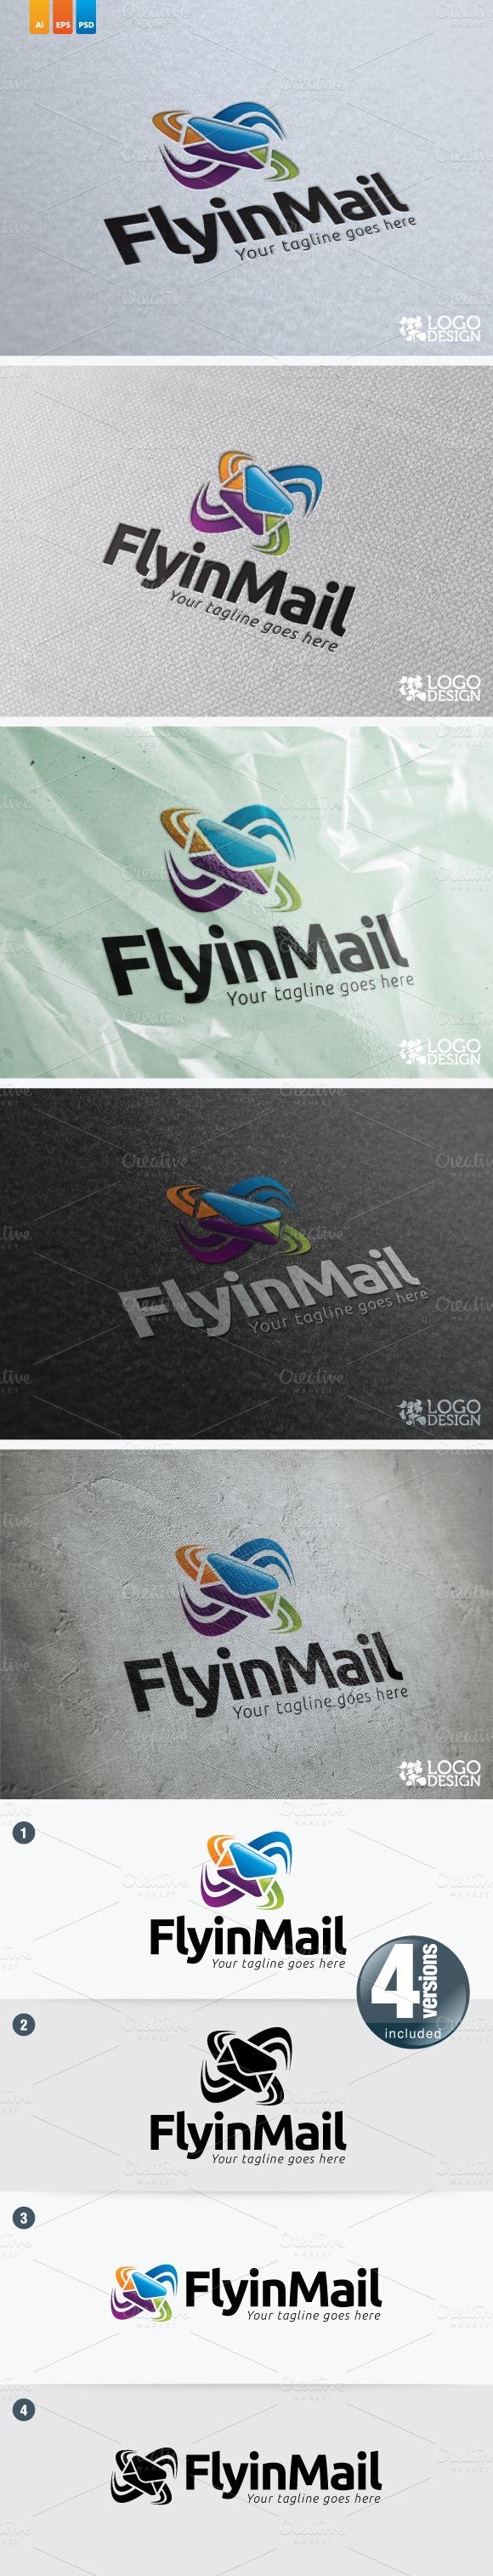 FlyinMail